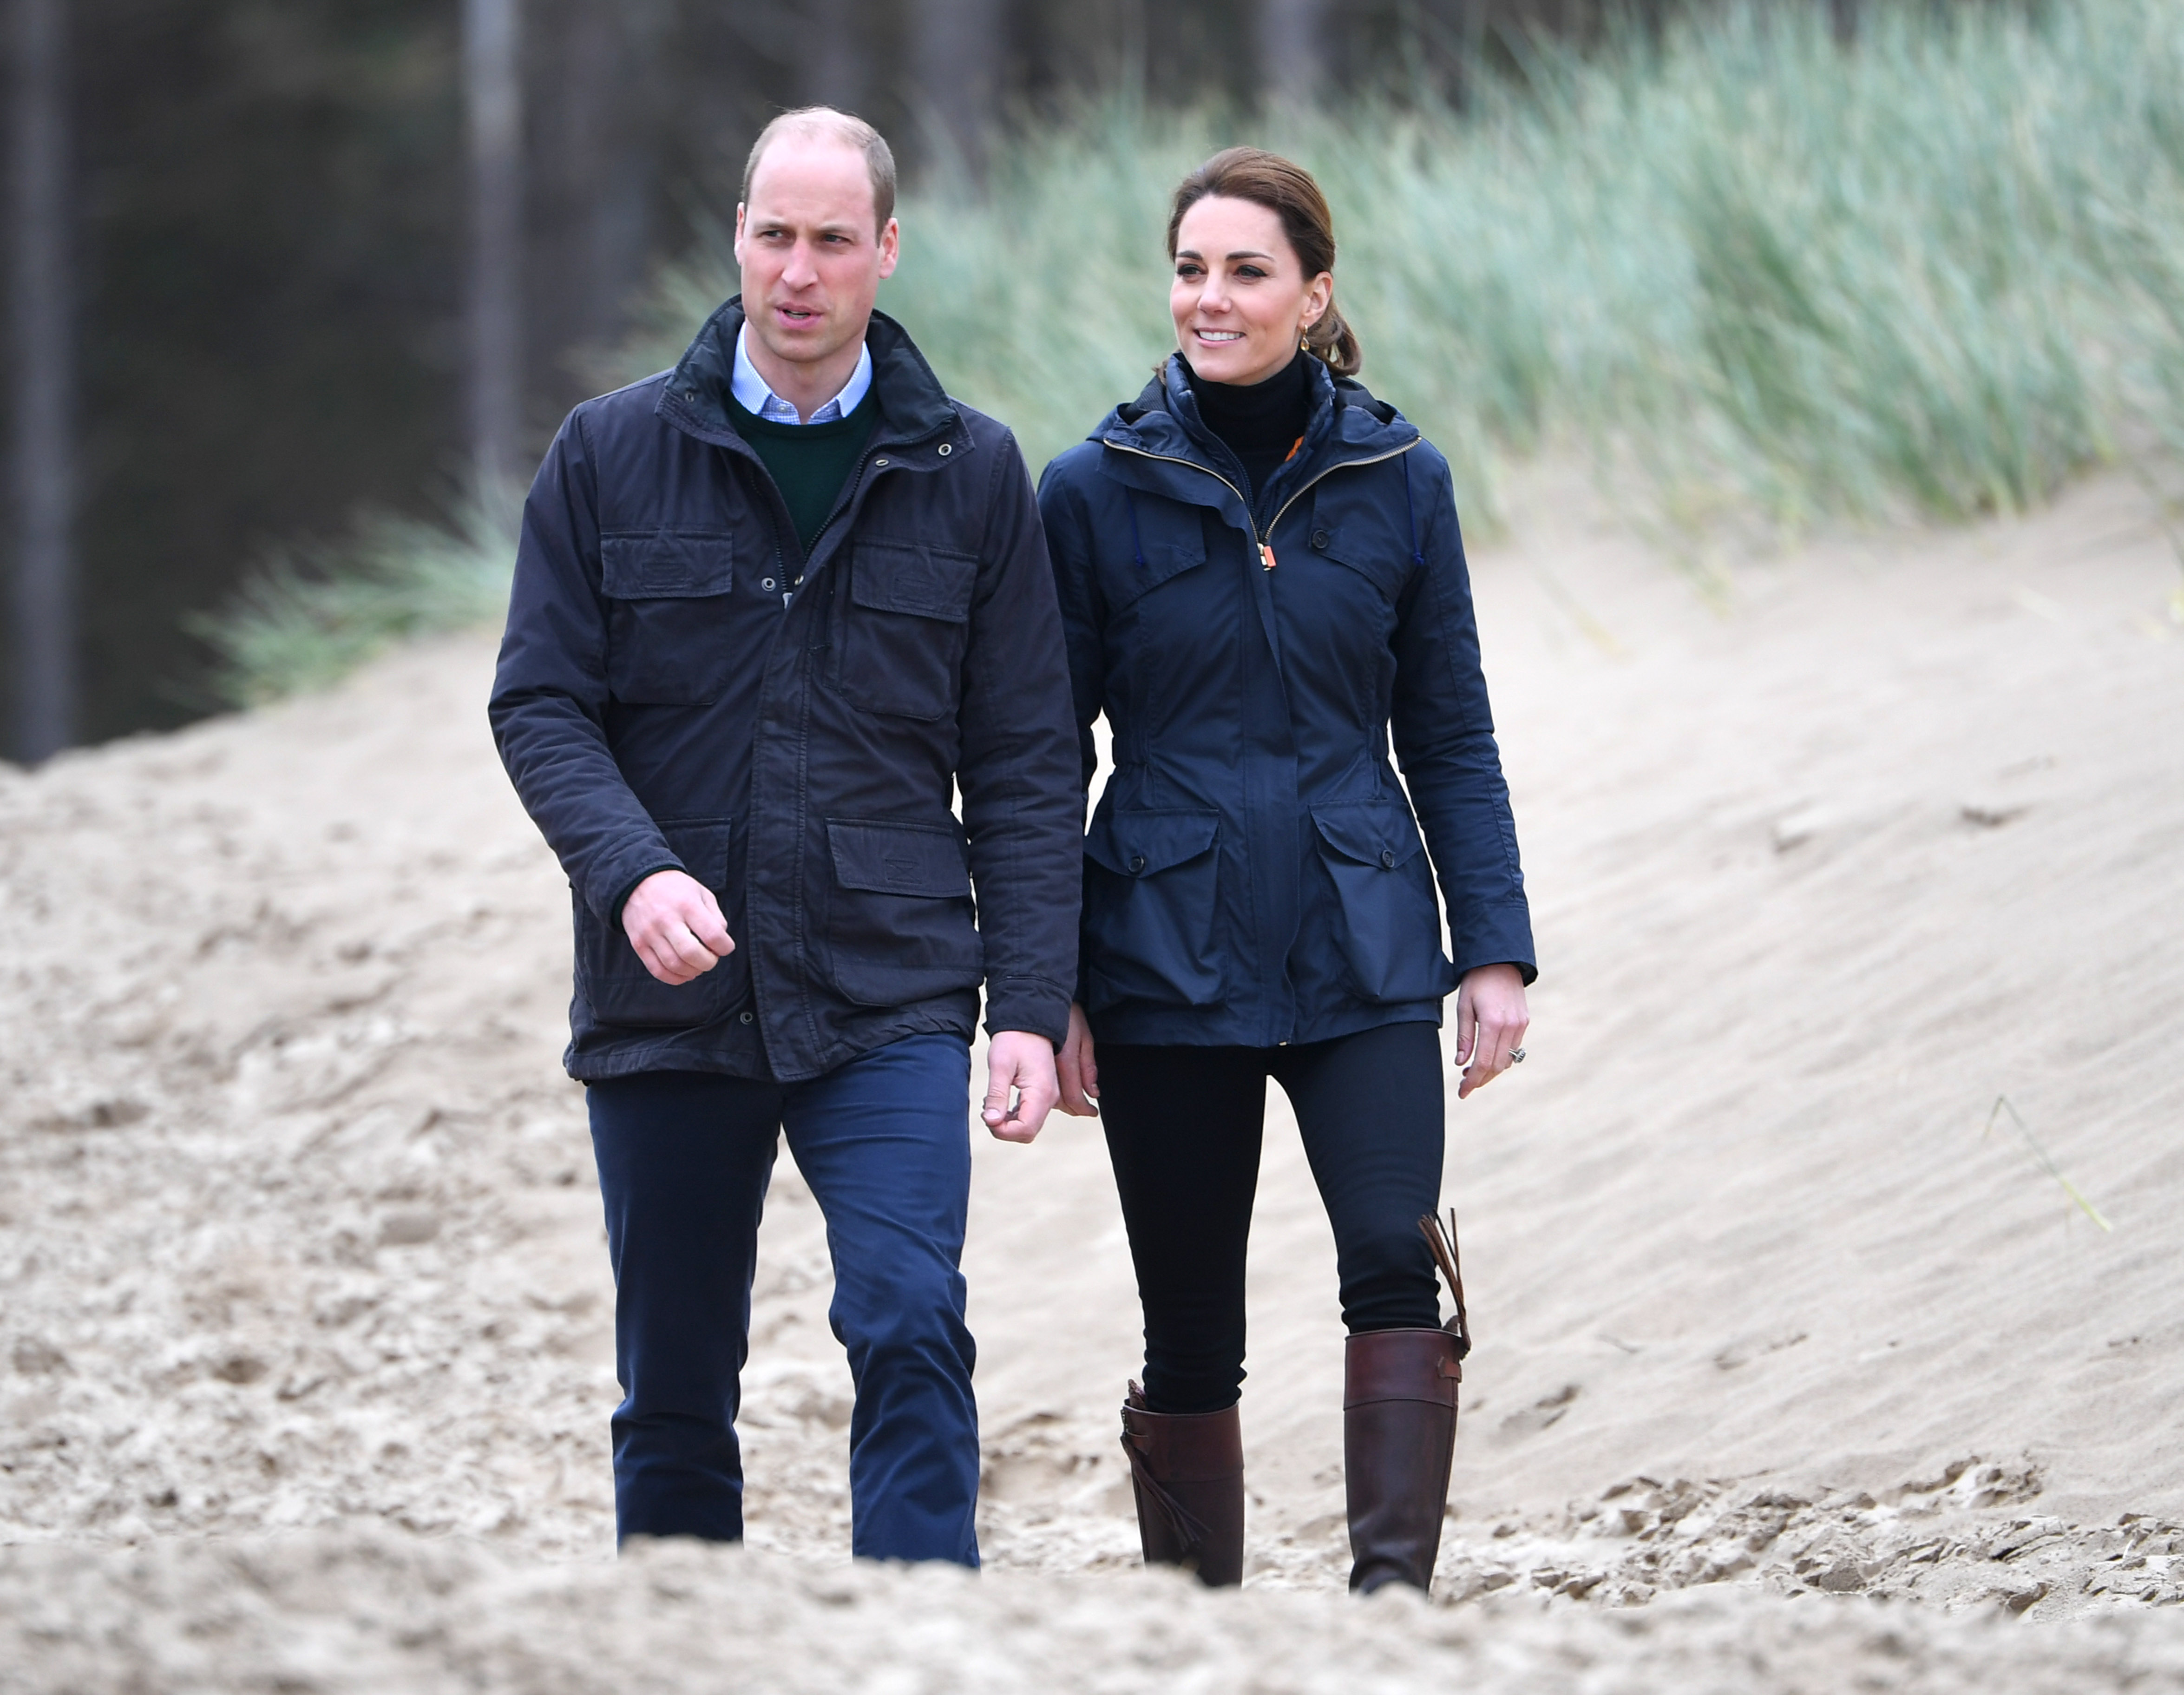 Prințul William și Kate Middleton